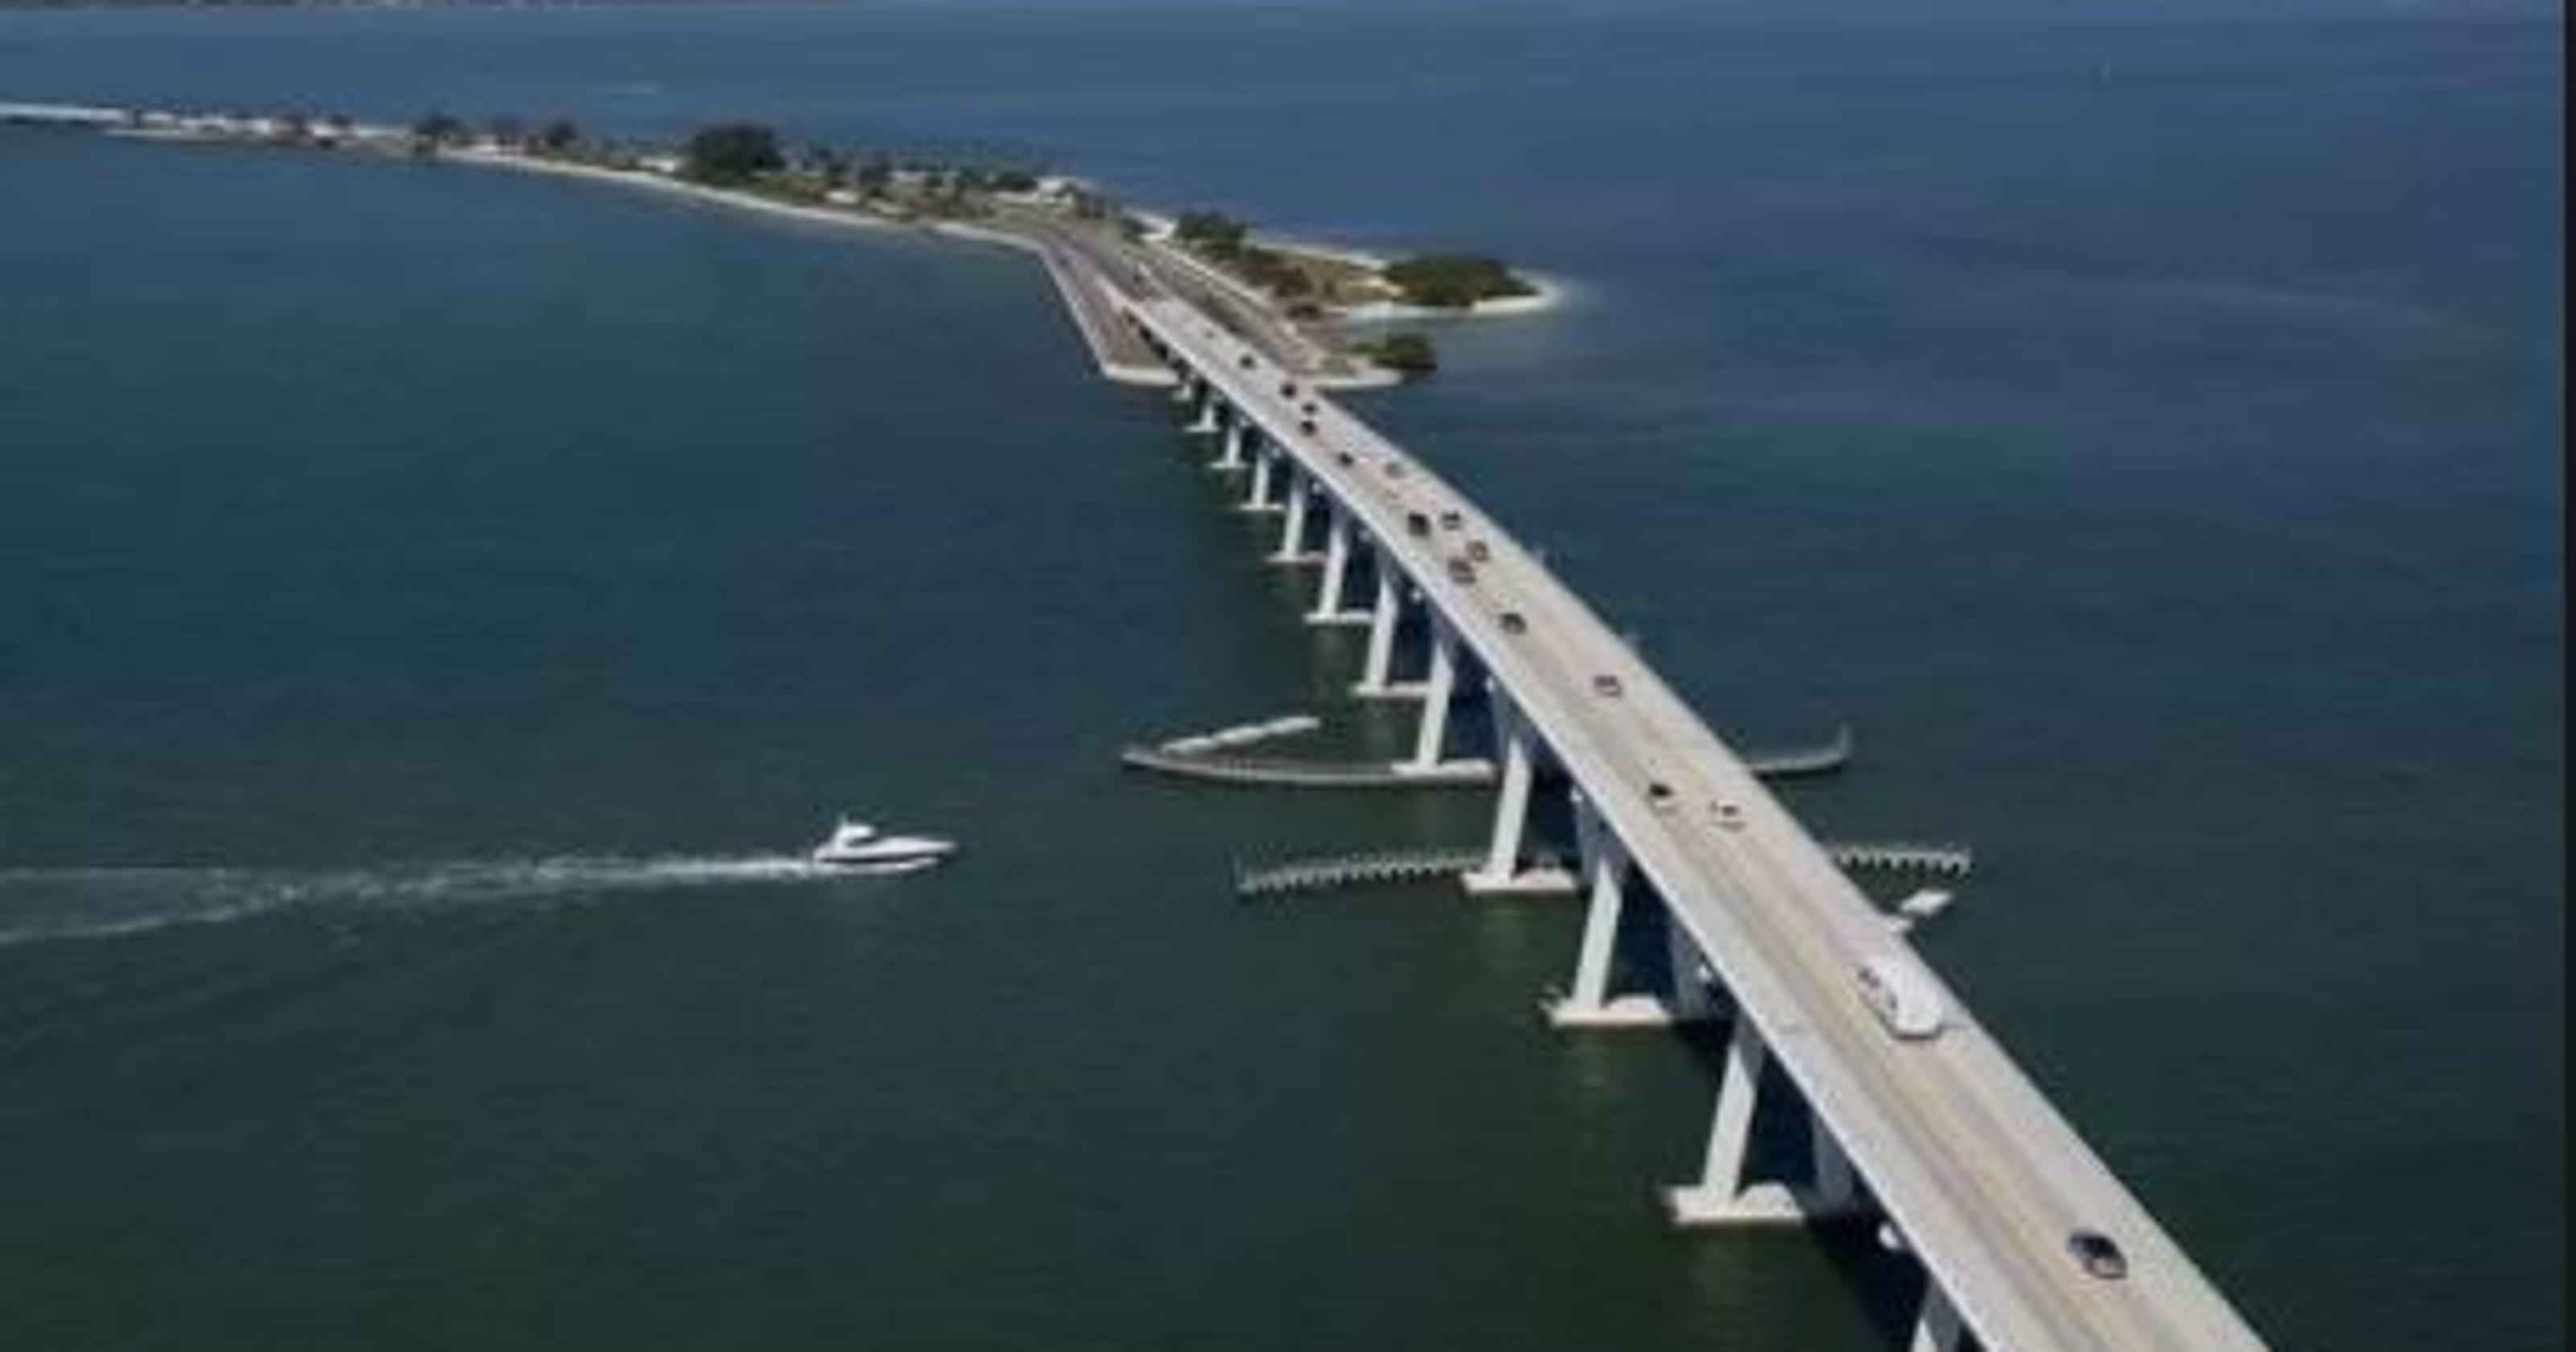 Hurricane Irma Sanibel Causeway Closed Until Cleared Bridge Inspections Begin Early Monday